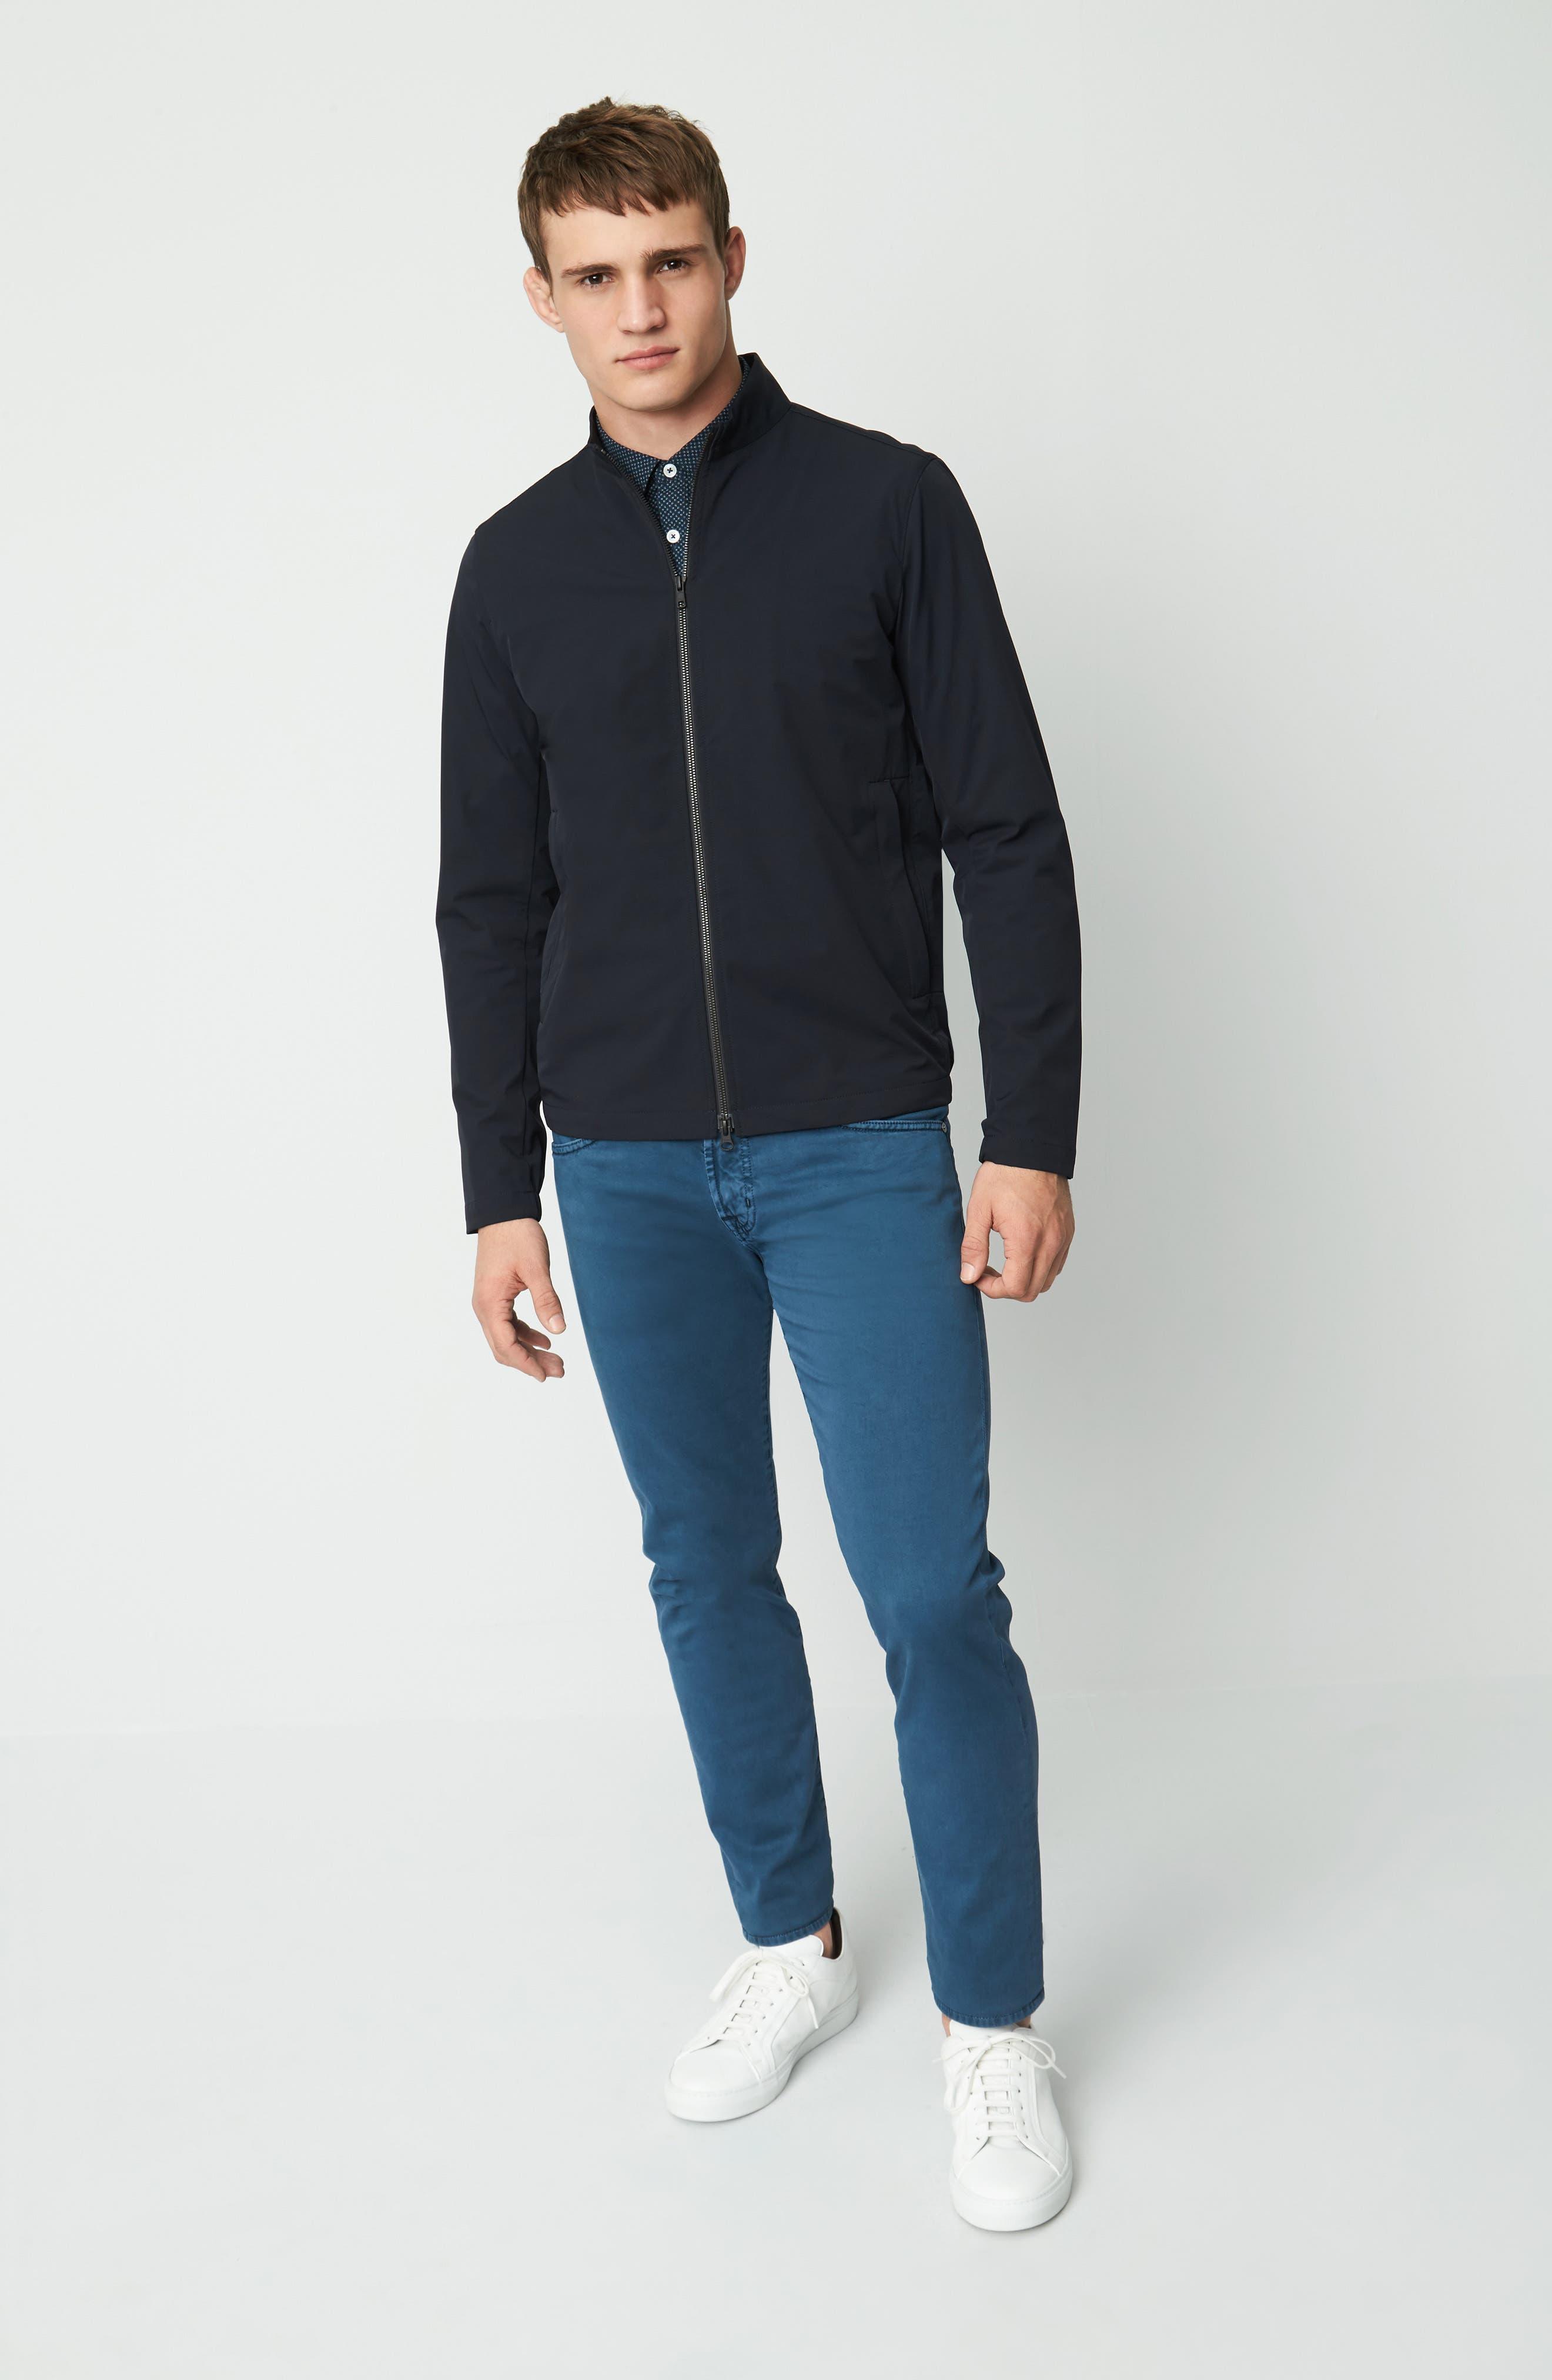 Scotty Bevan Zip Front Jacket,                             Alternate thumbnail 7, color,                             Eclipse